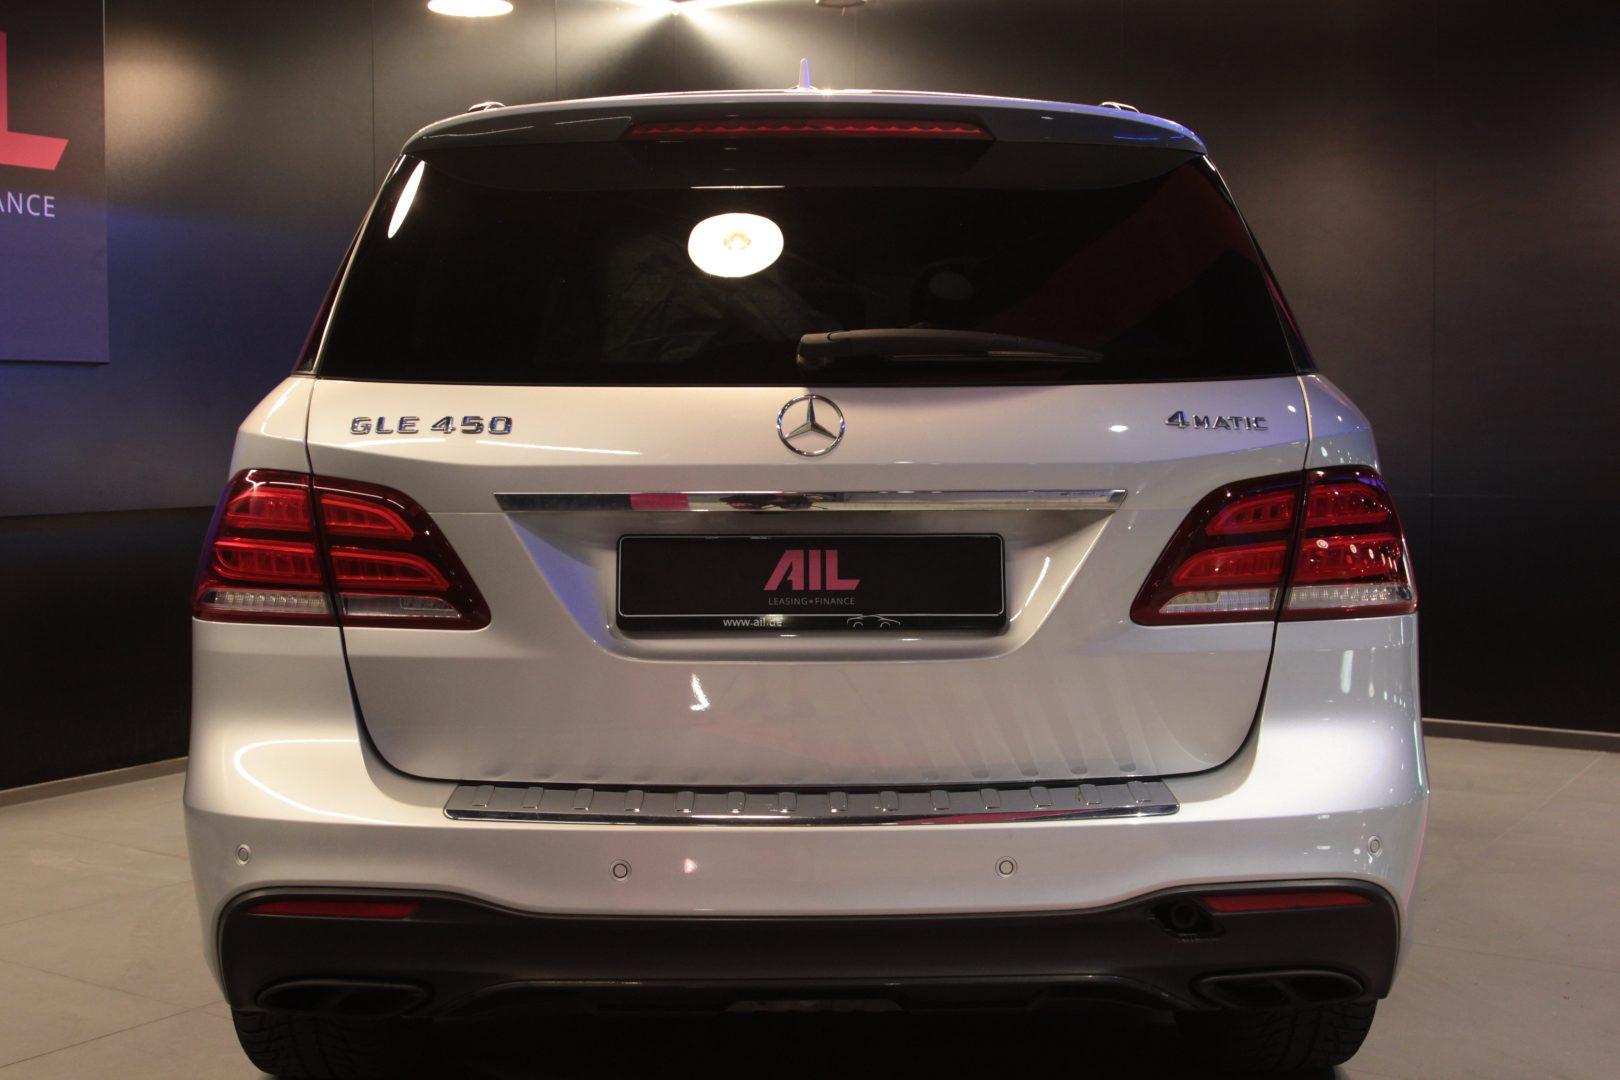 AIL Mercedes-Benz GLE 450 AMG 4Matic 10